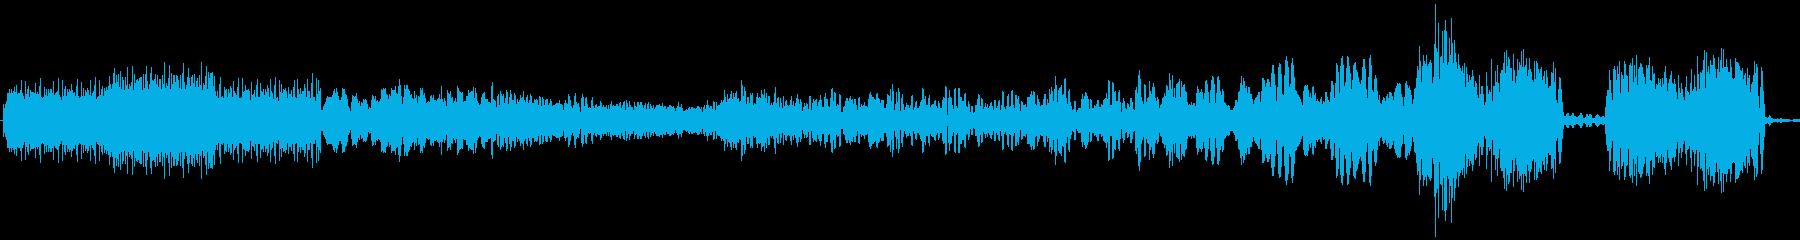 SciFi EC01_92_4の再生済みの波形